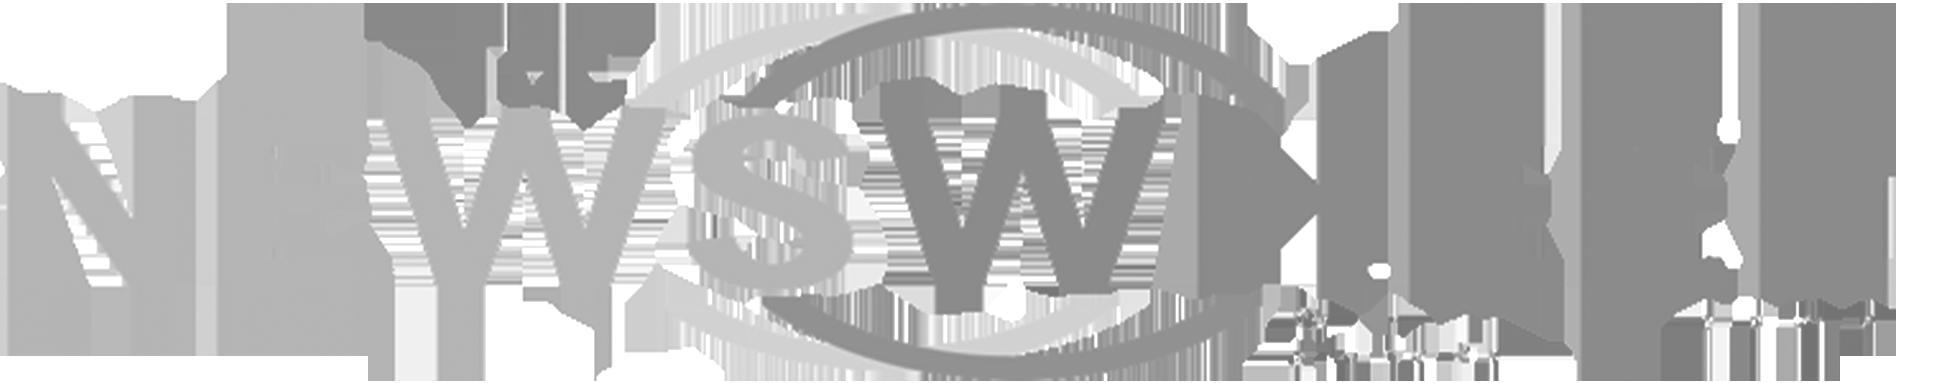 newswheel-grey